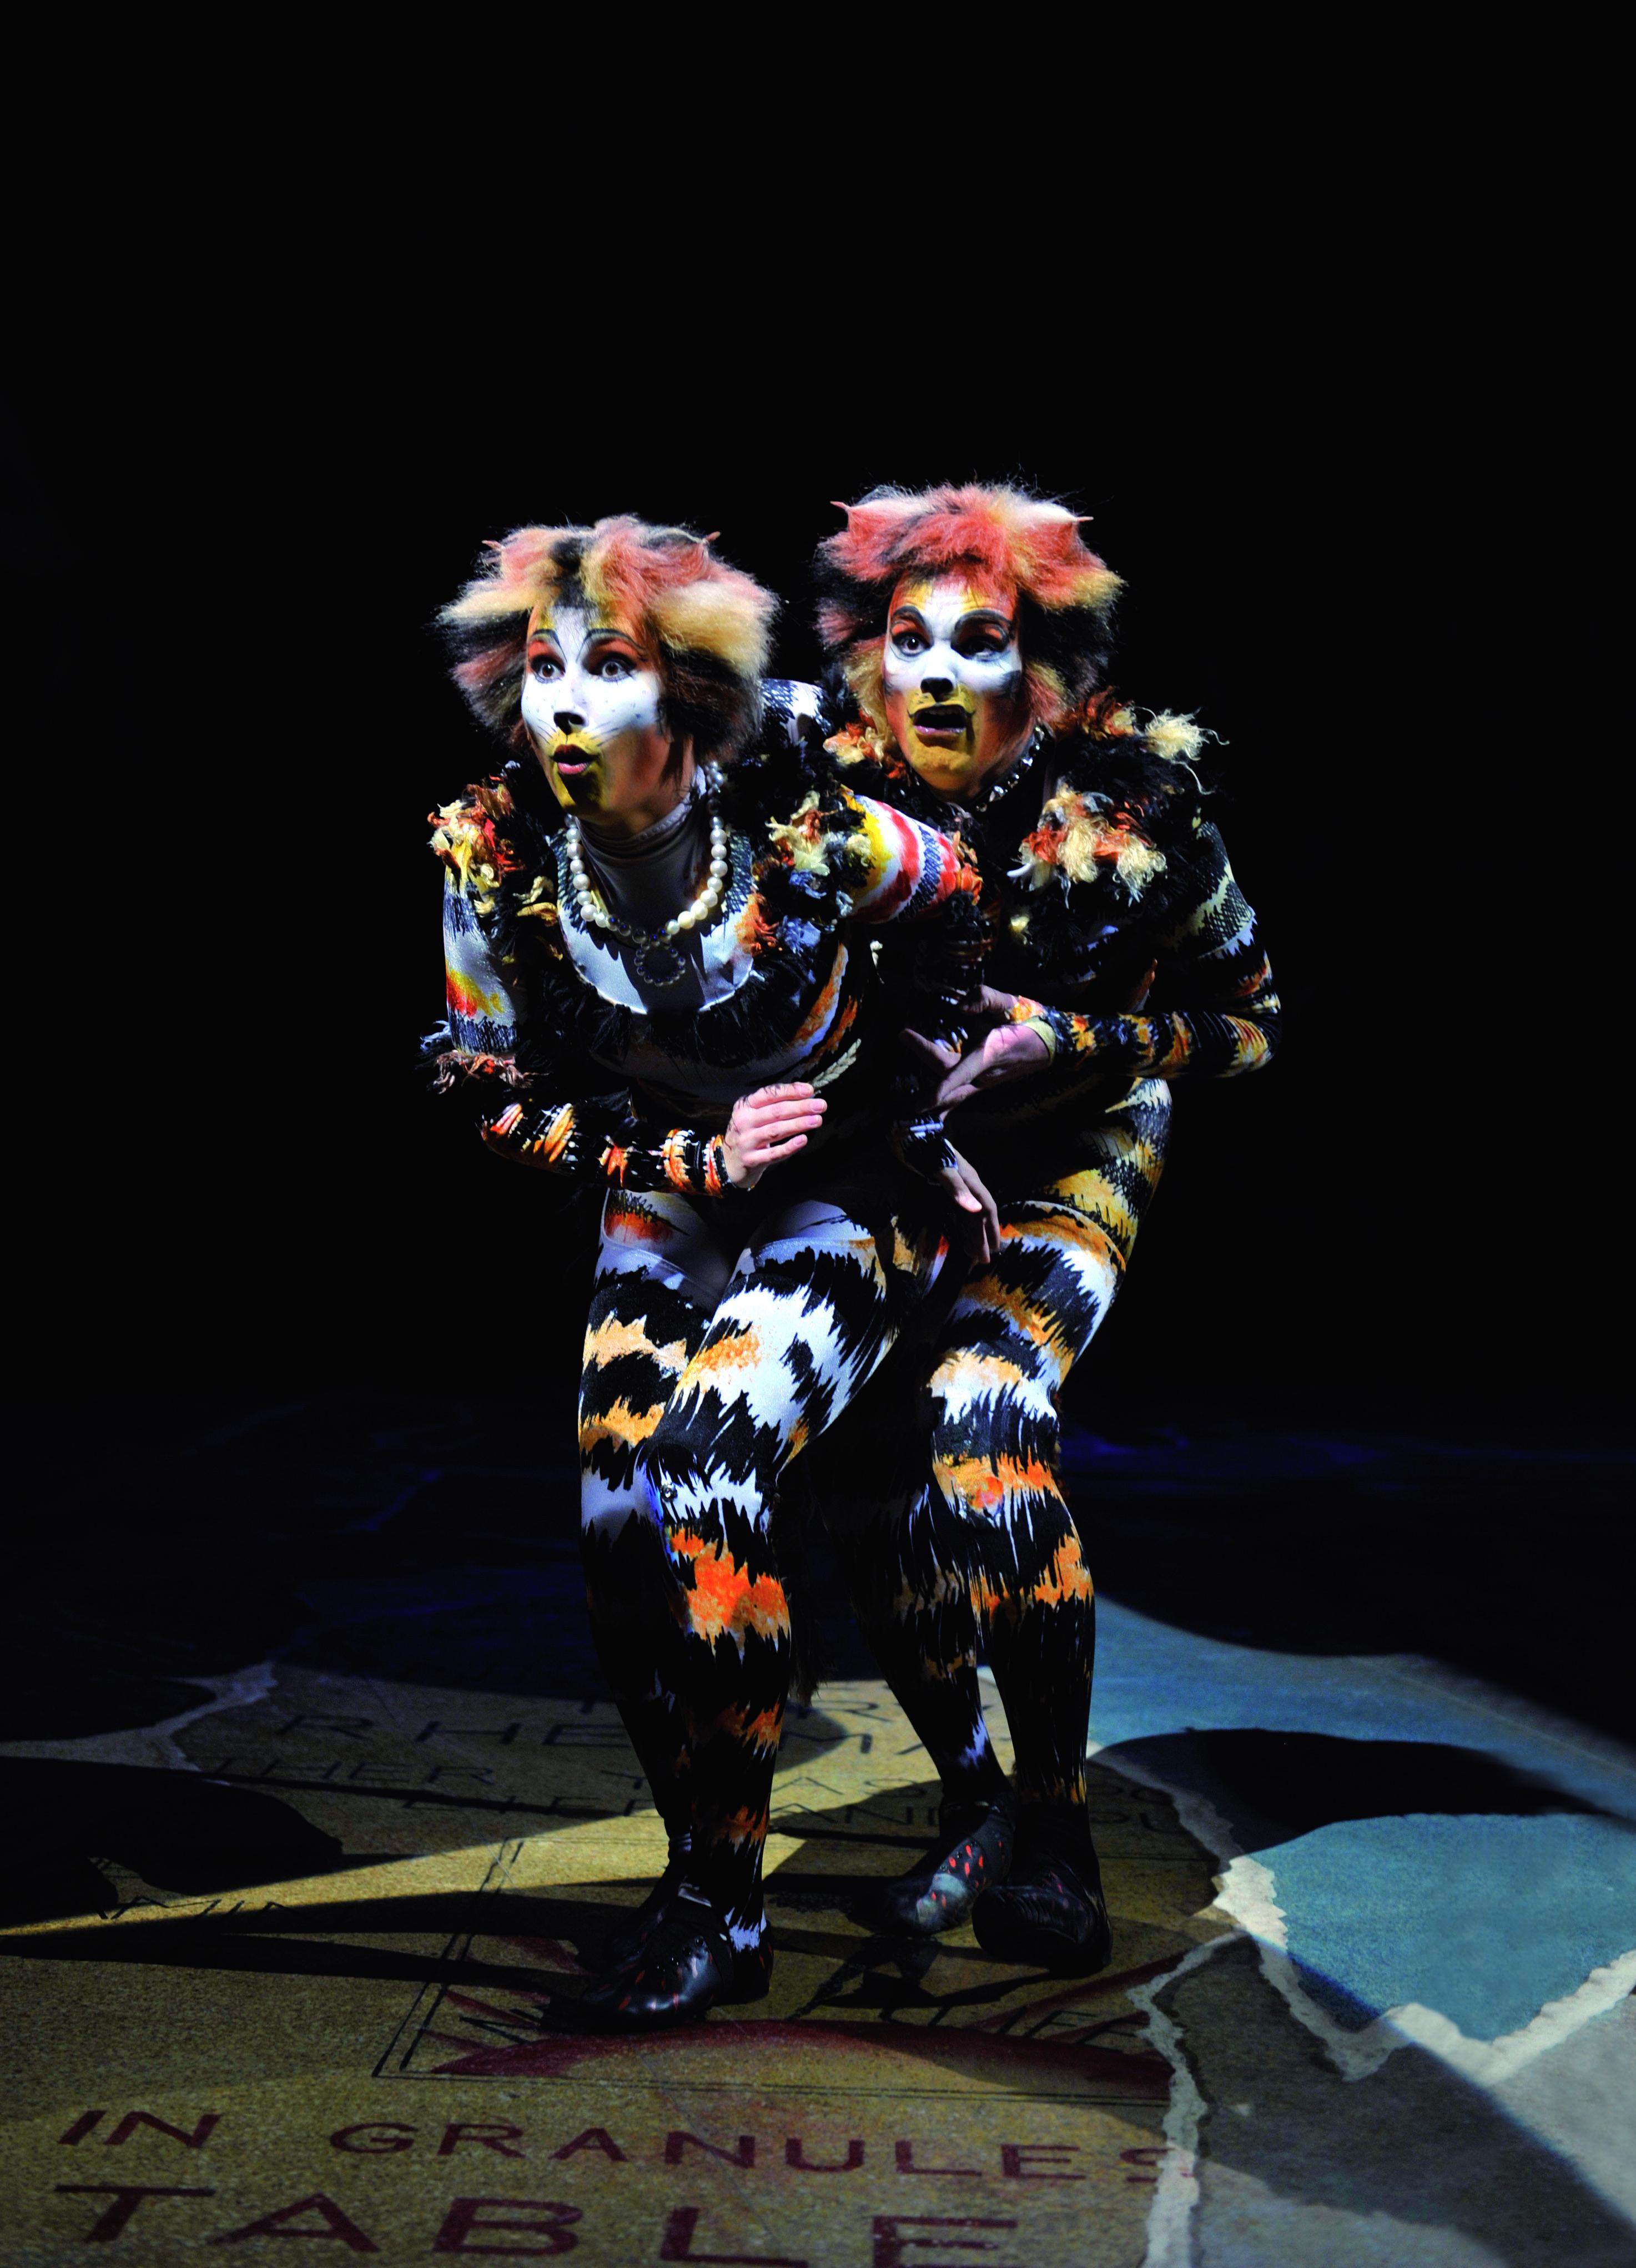 Mungojerrie & Rumpleteazer Jellicle cats, Cats musical